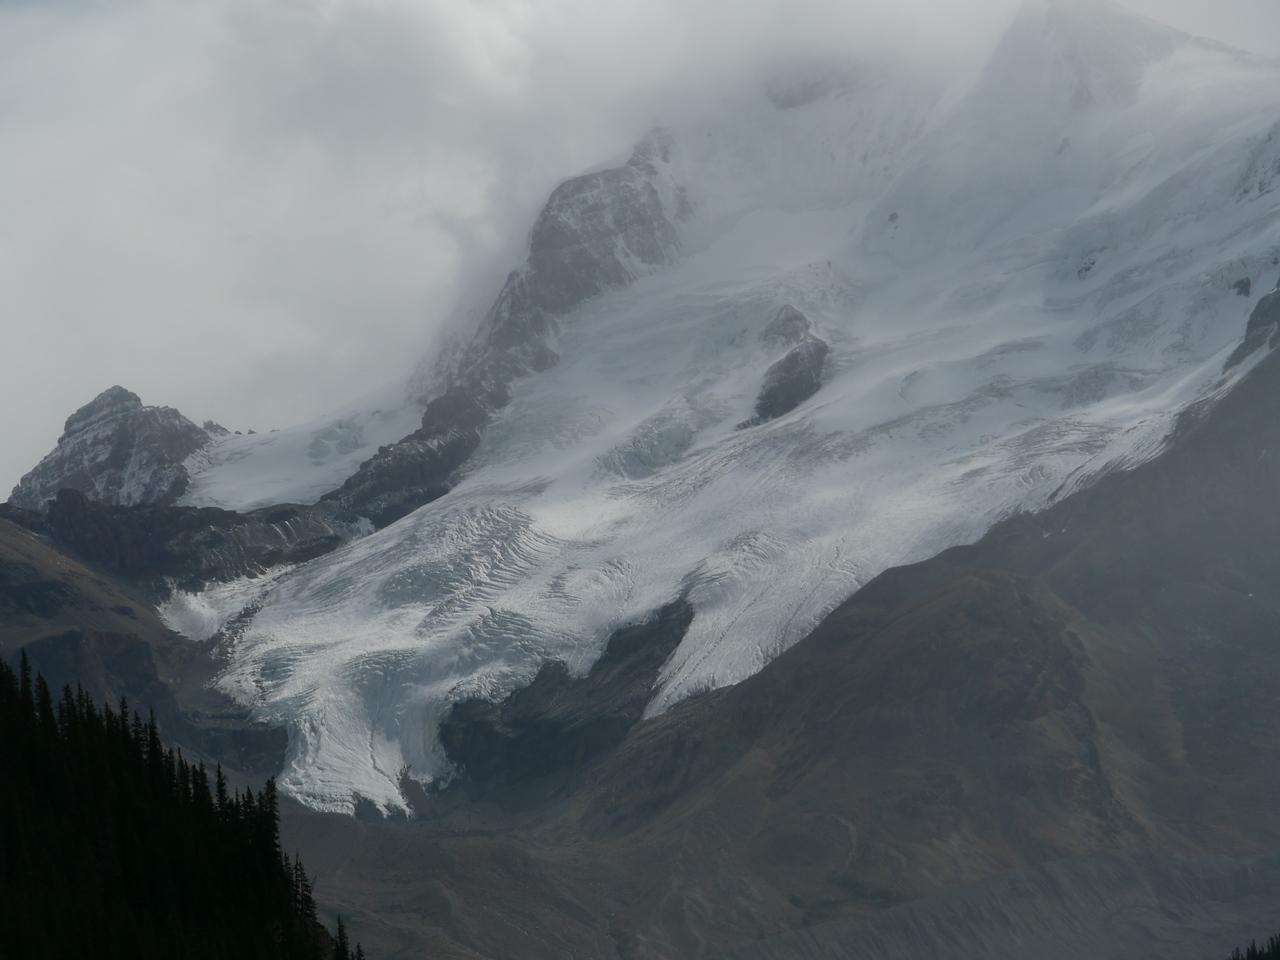 © RobAng 2009, Banff-/Jasper, Banff-/Jasper National Park - Icefields Parkway, 1072.3 m.ü.M., Alberta, Kanada